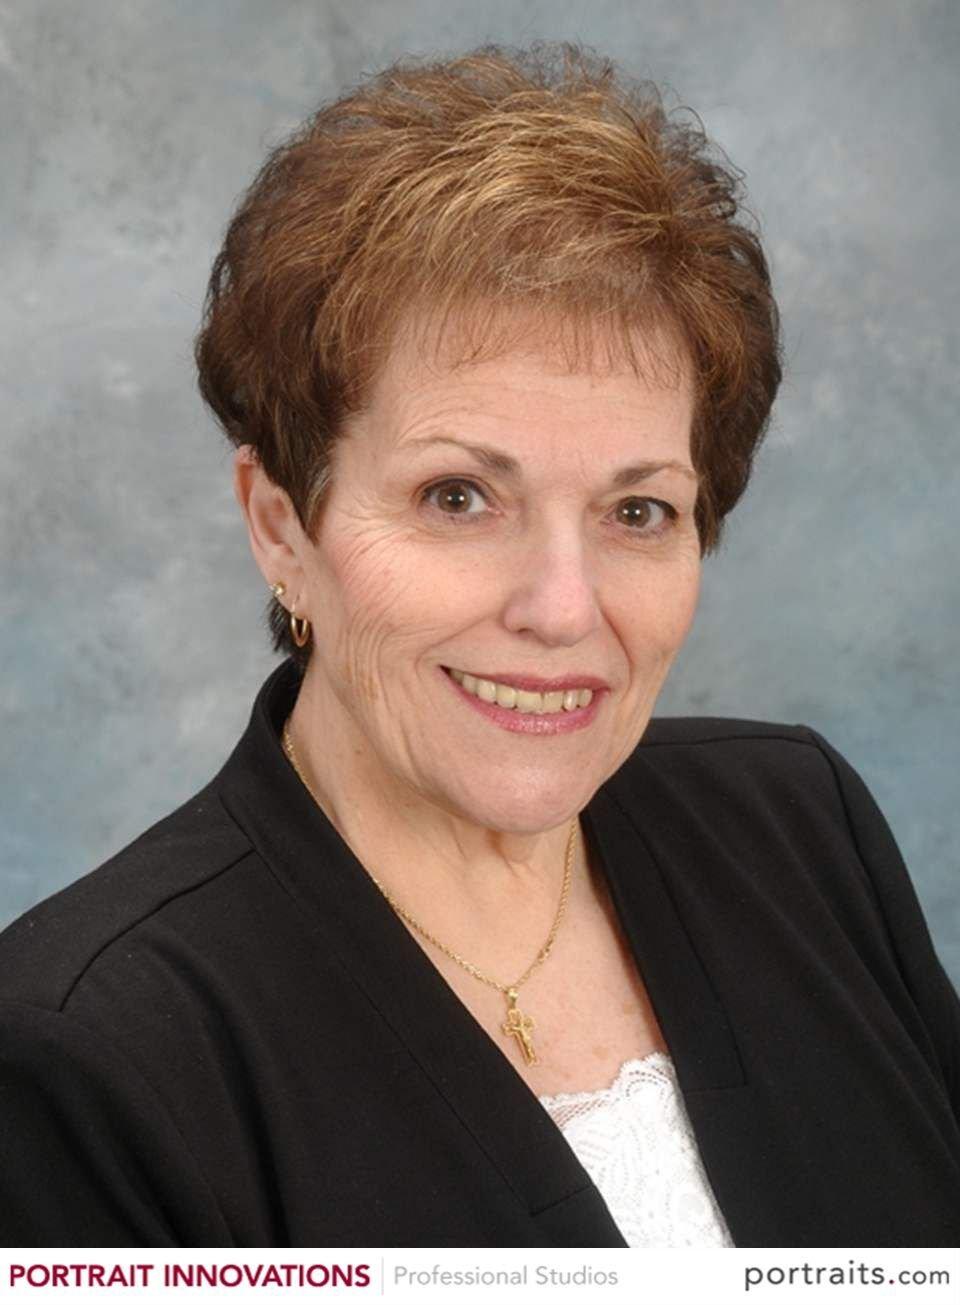 Virginia 'Ginny' McGraw